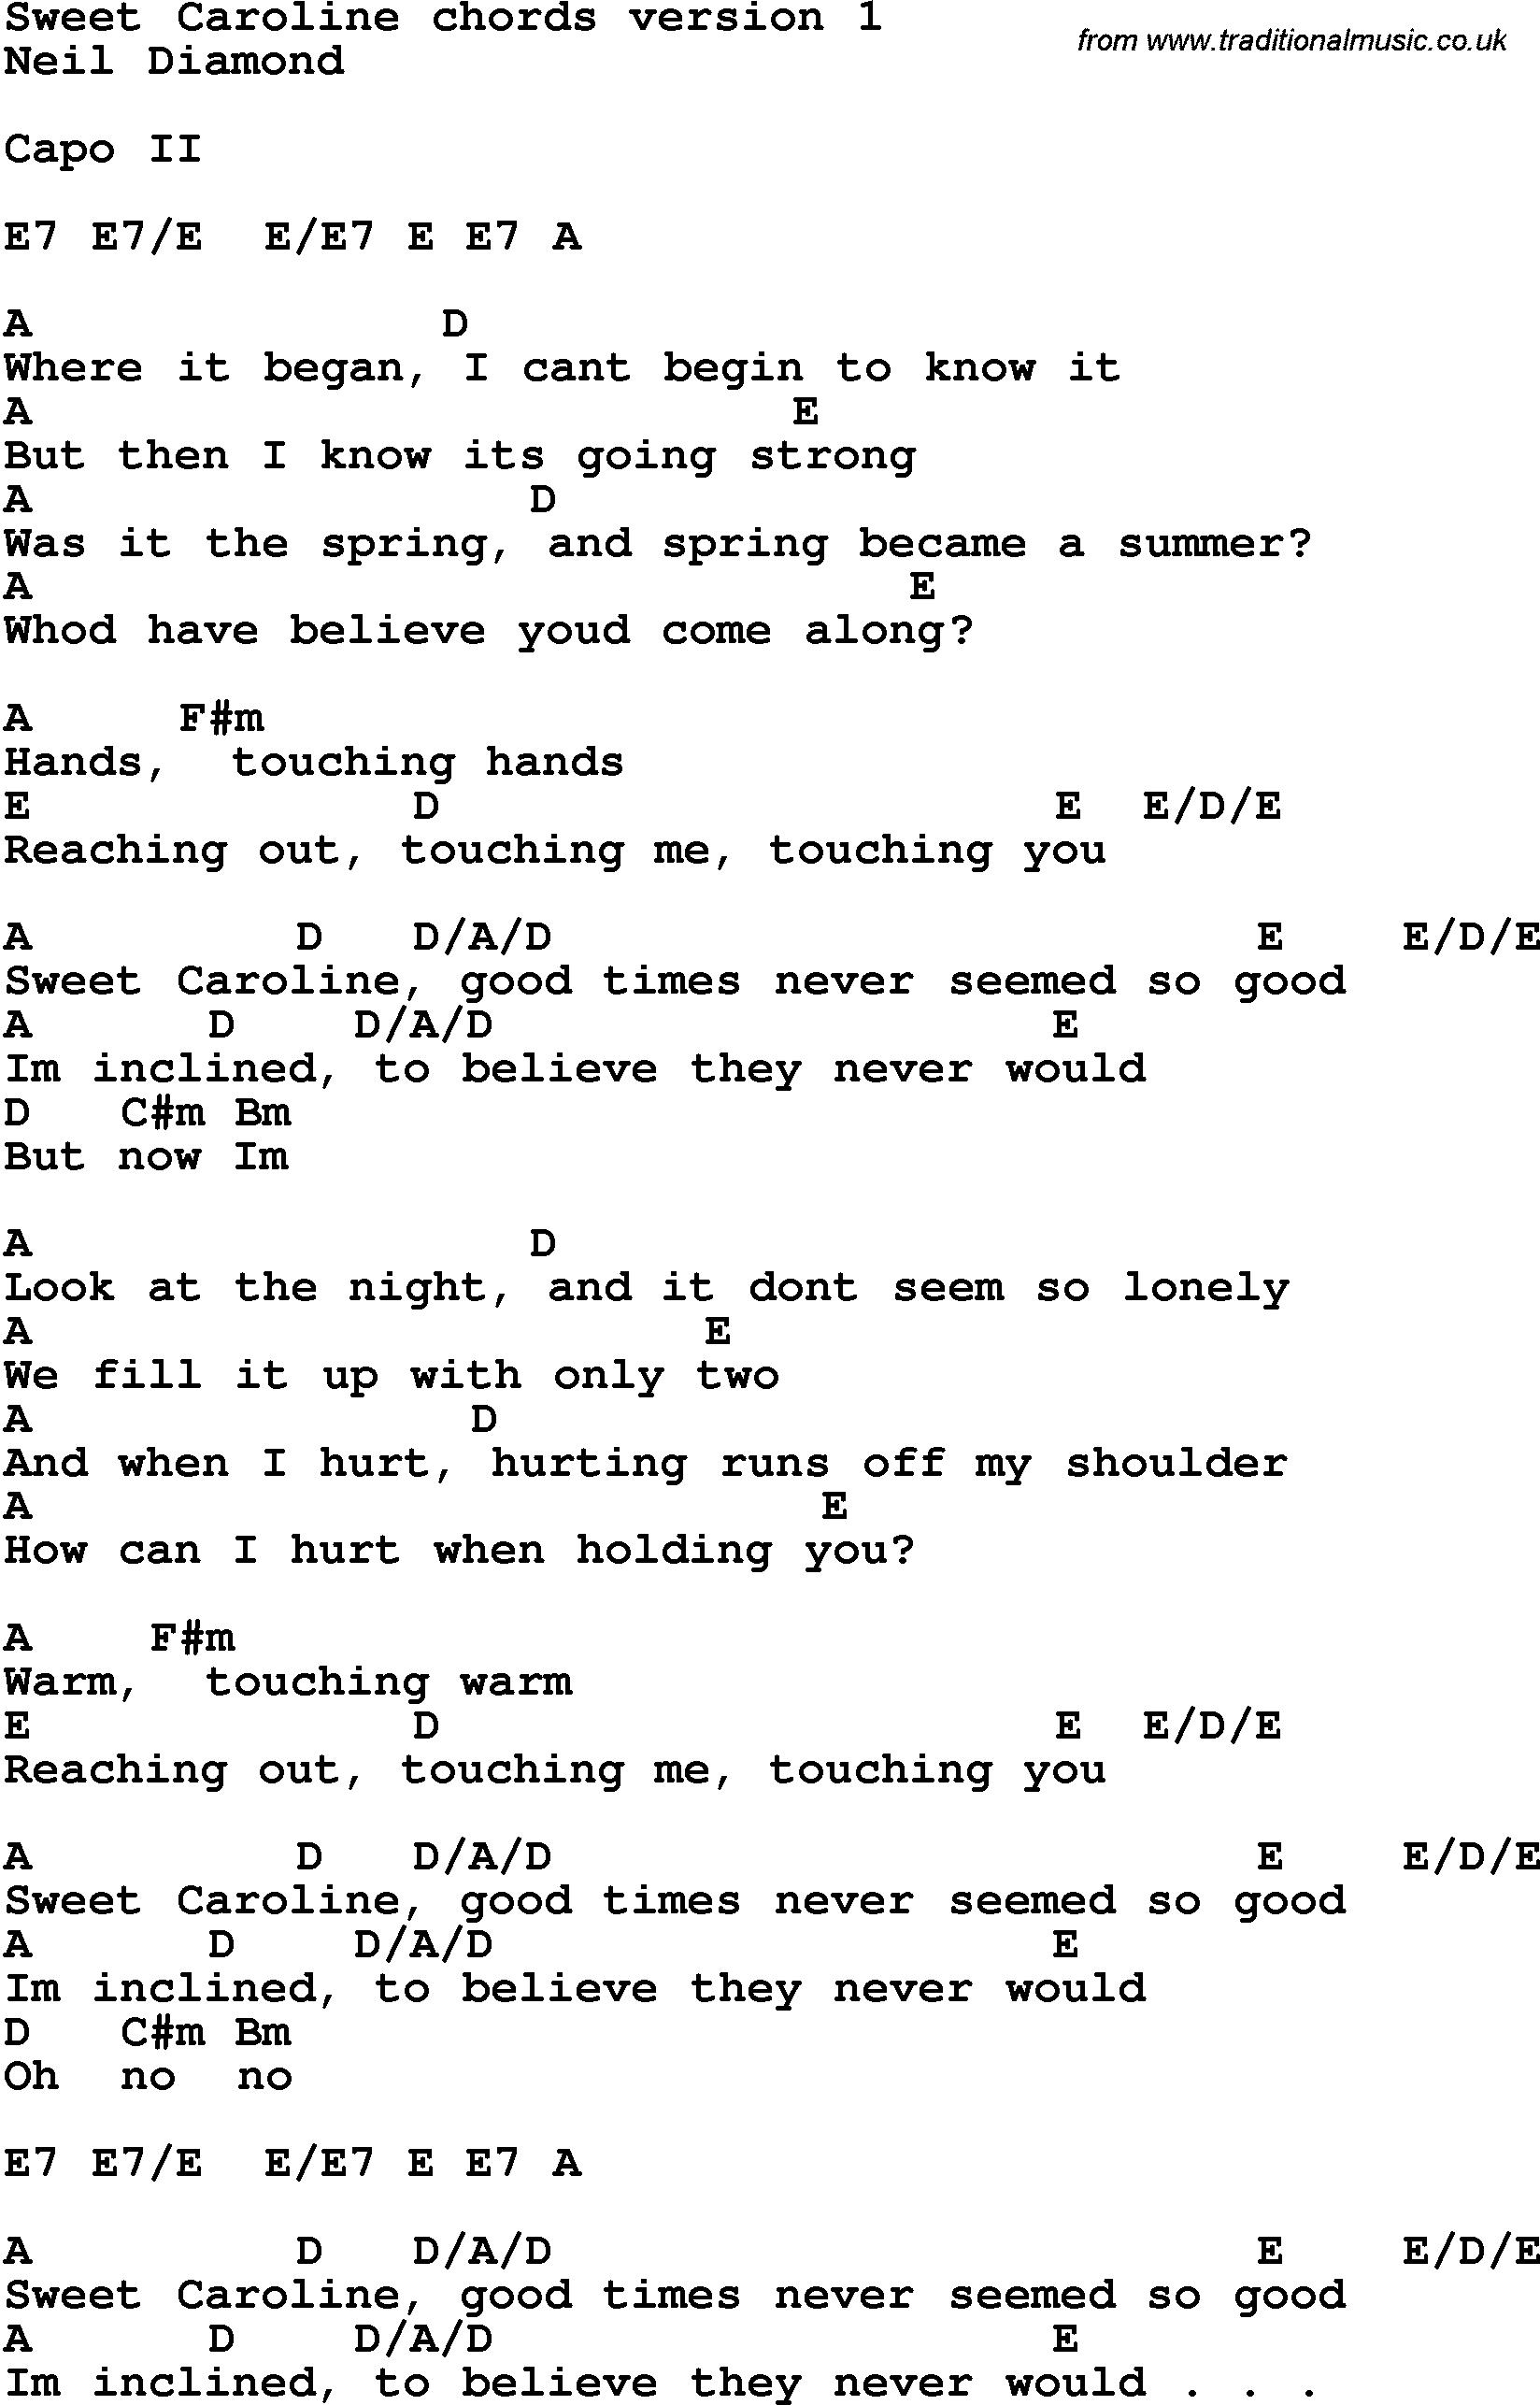 Redemption Song Chords Lagu Dan Kuncinya Song Chord Lyrics Song Lyrics With Guitar